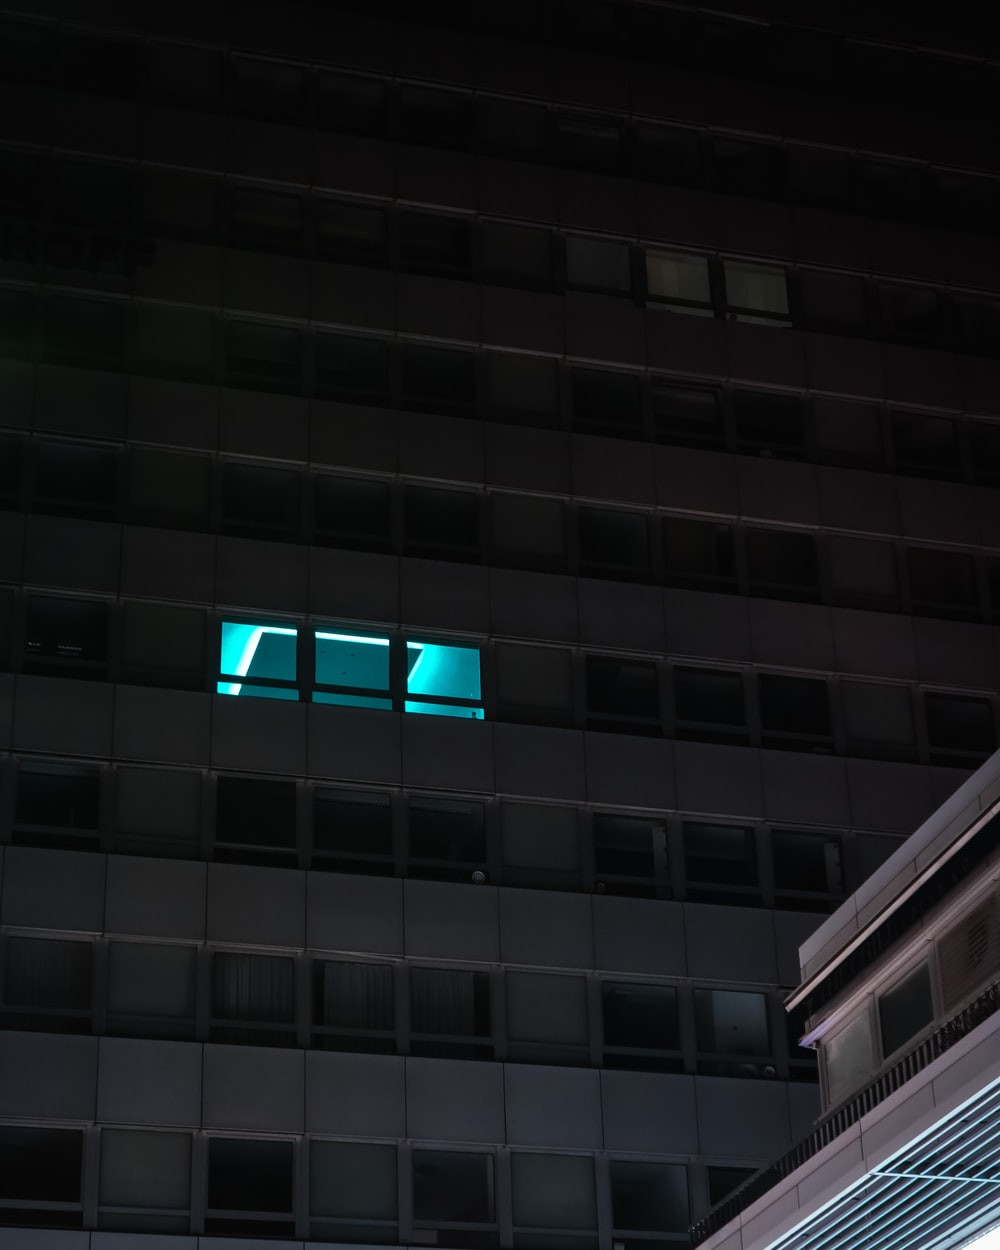 gray concrete building with blue light